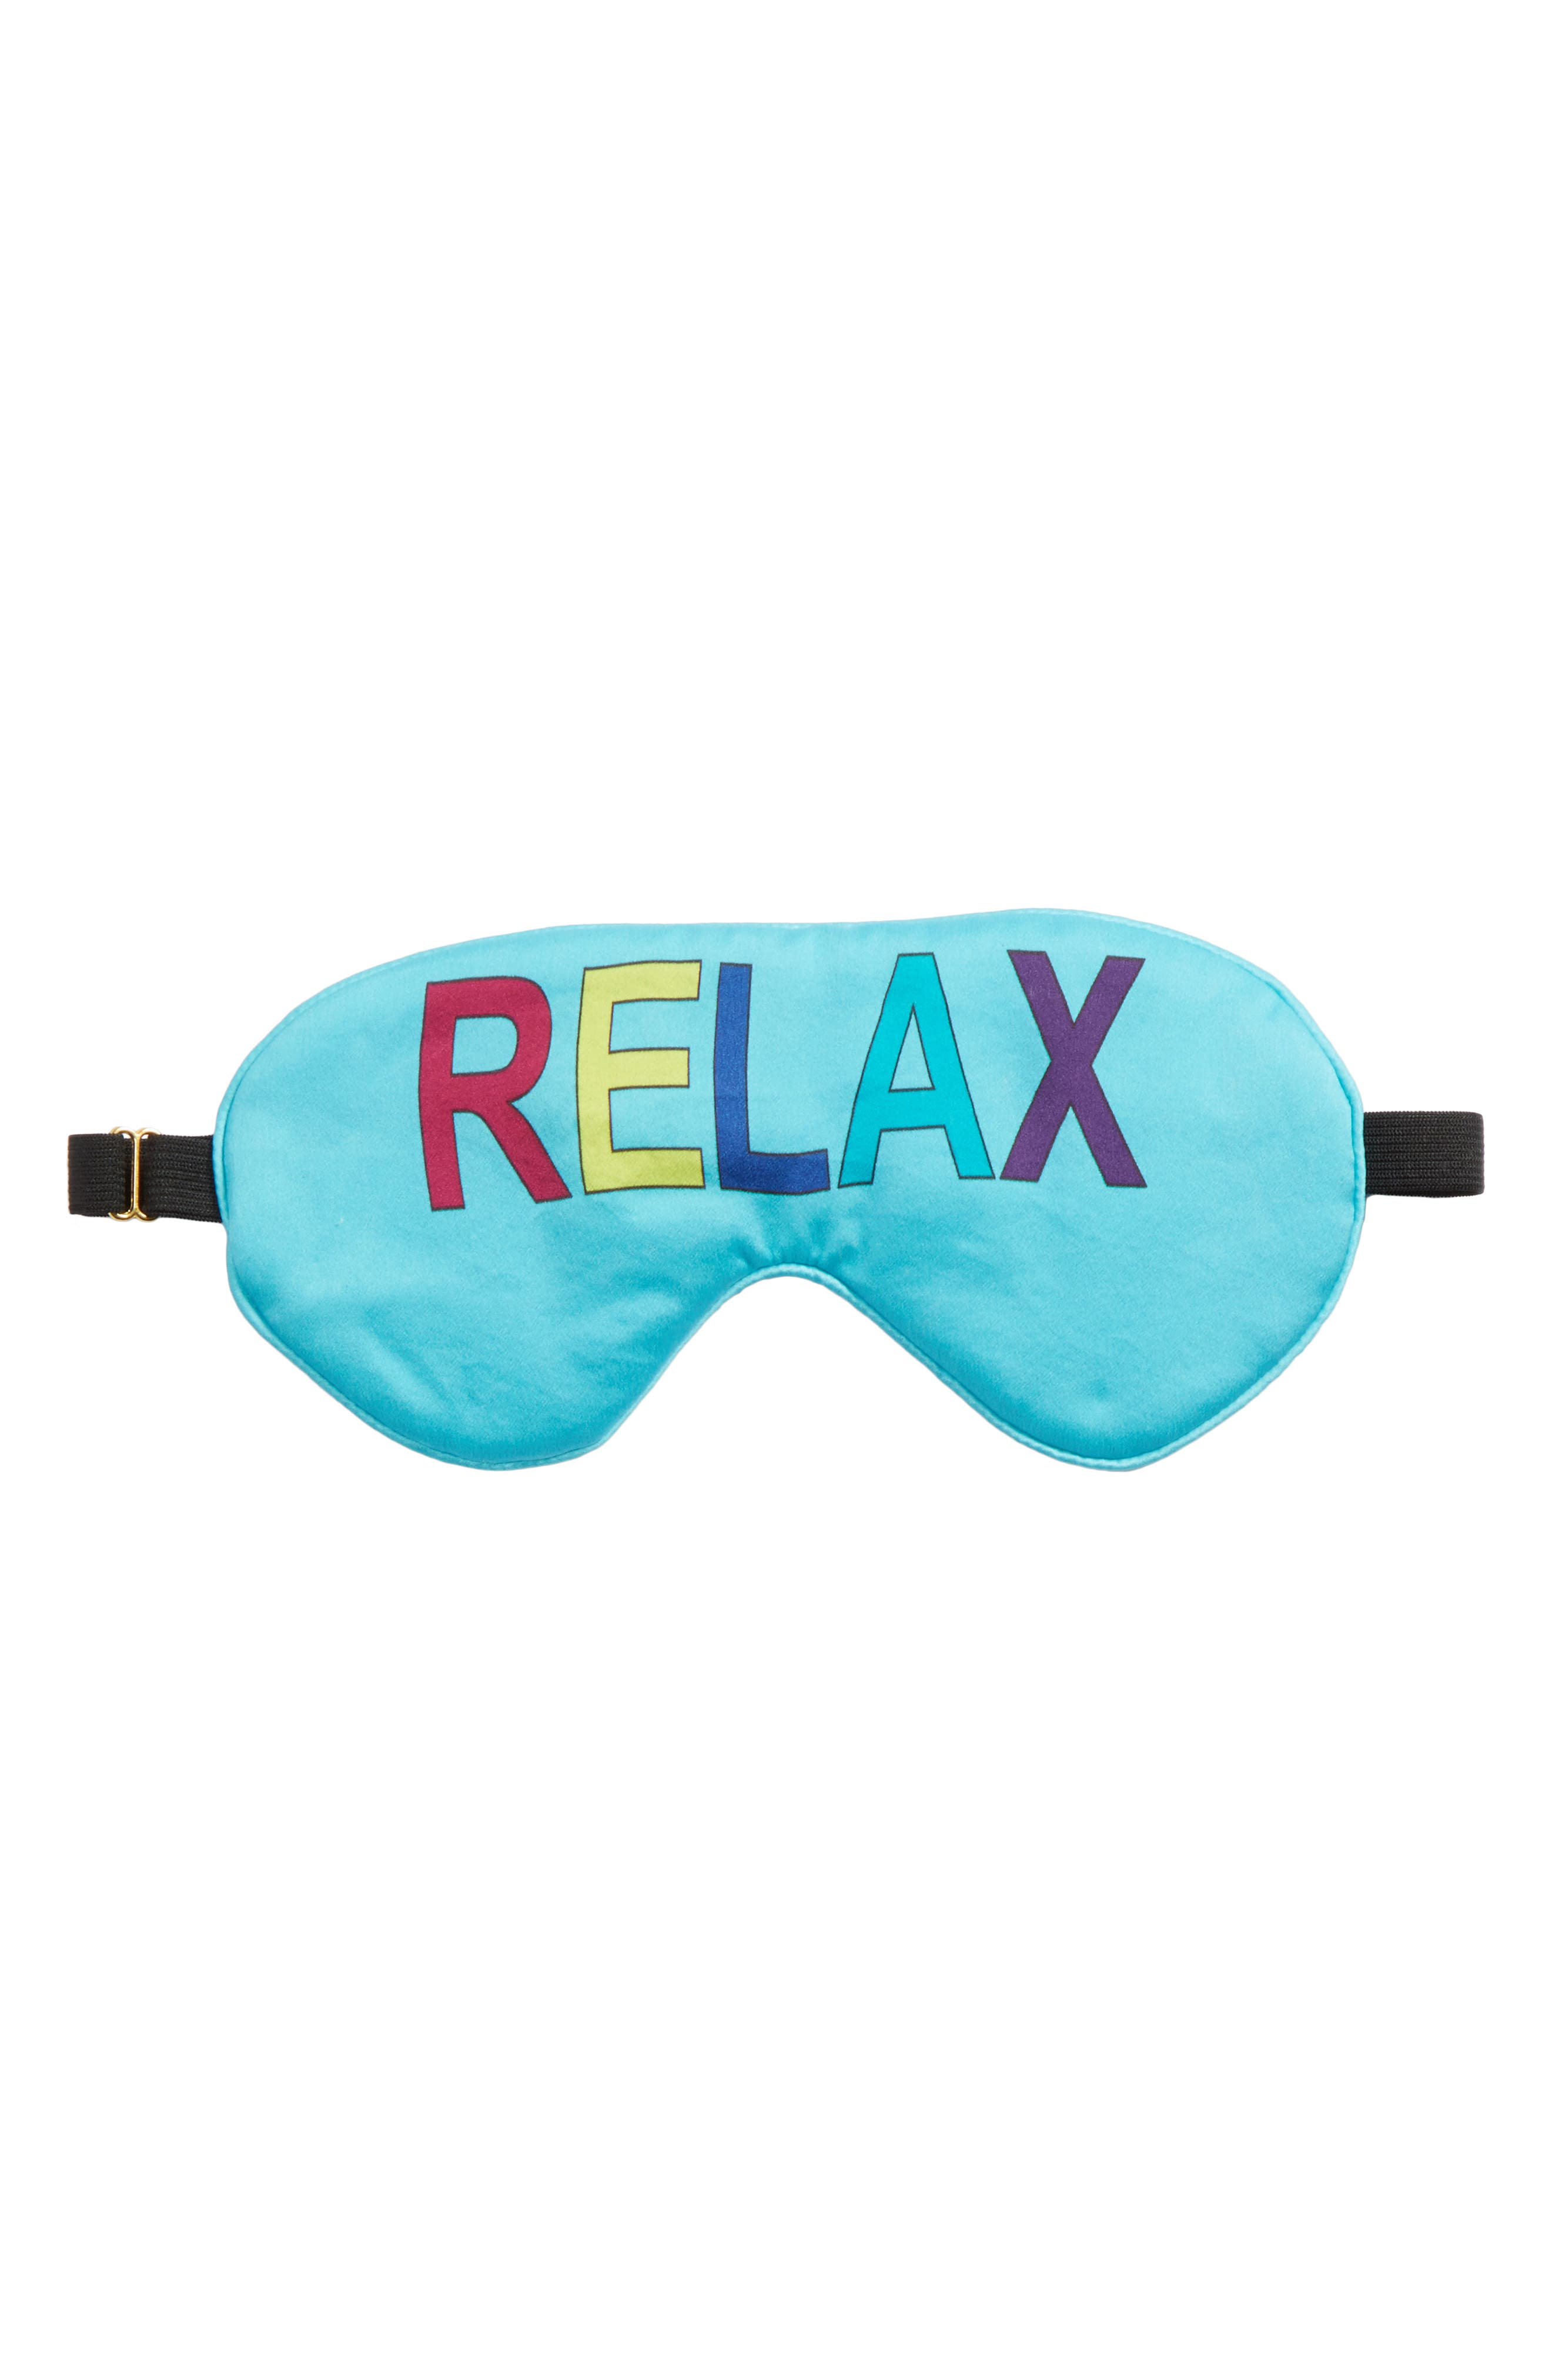 Relax Sleep Mask,                         Main,                         color, 400